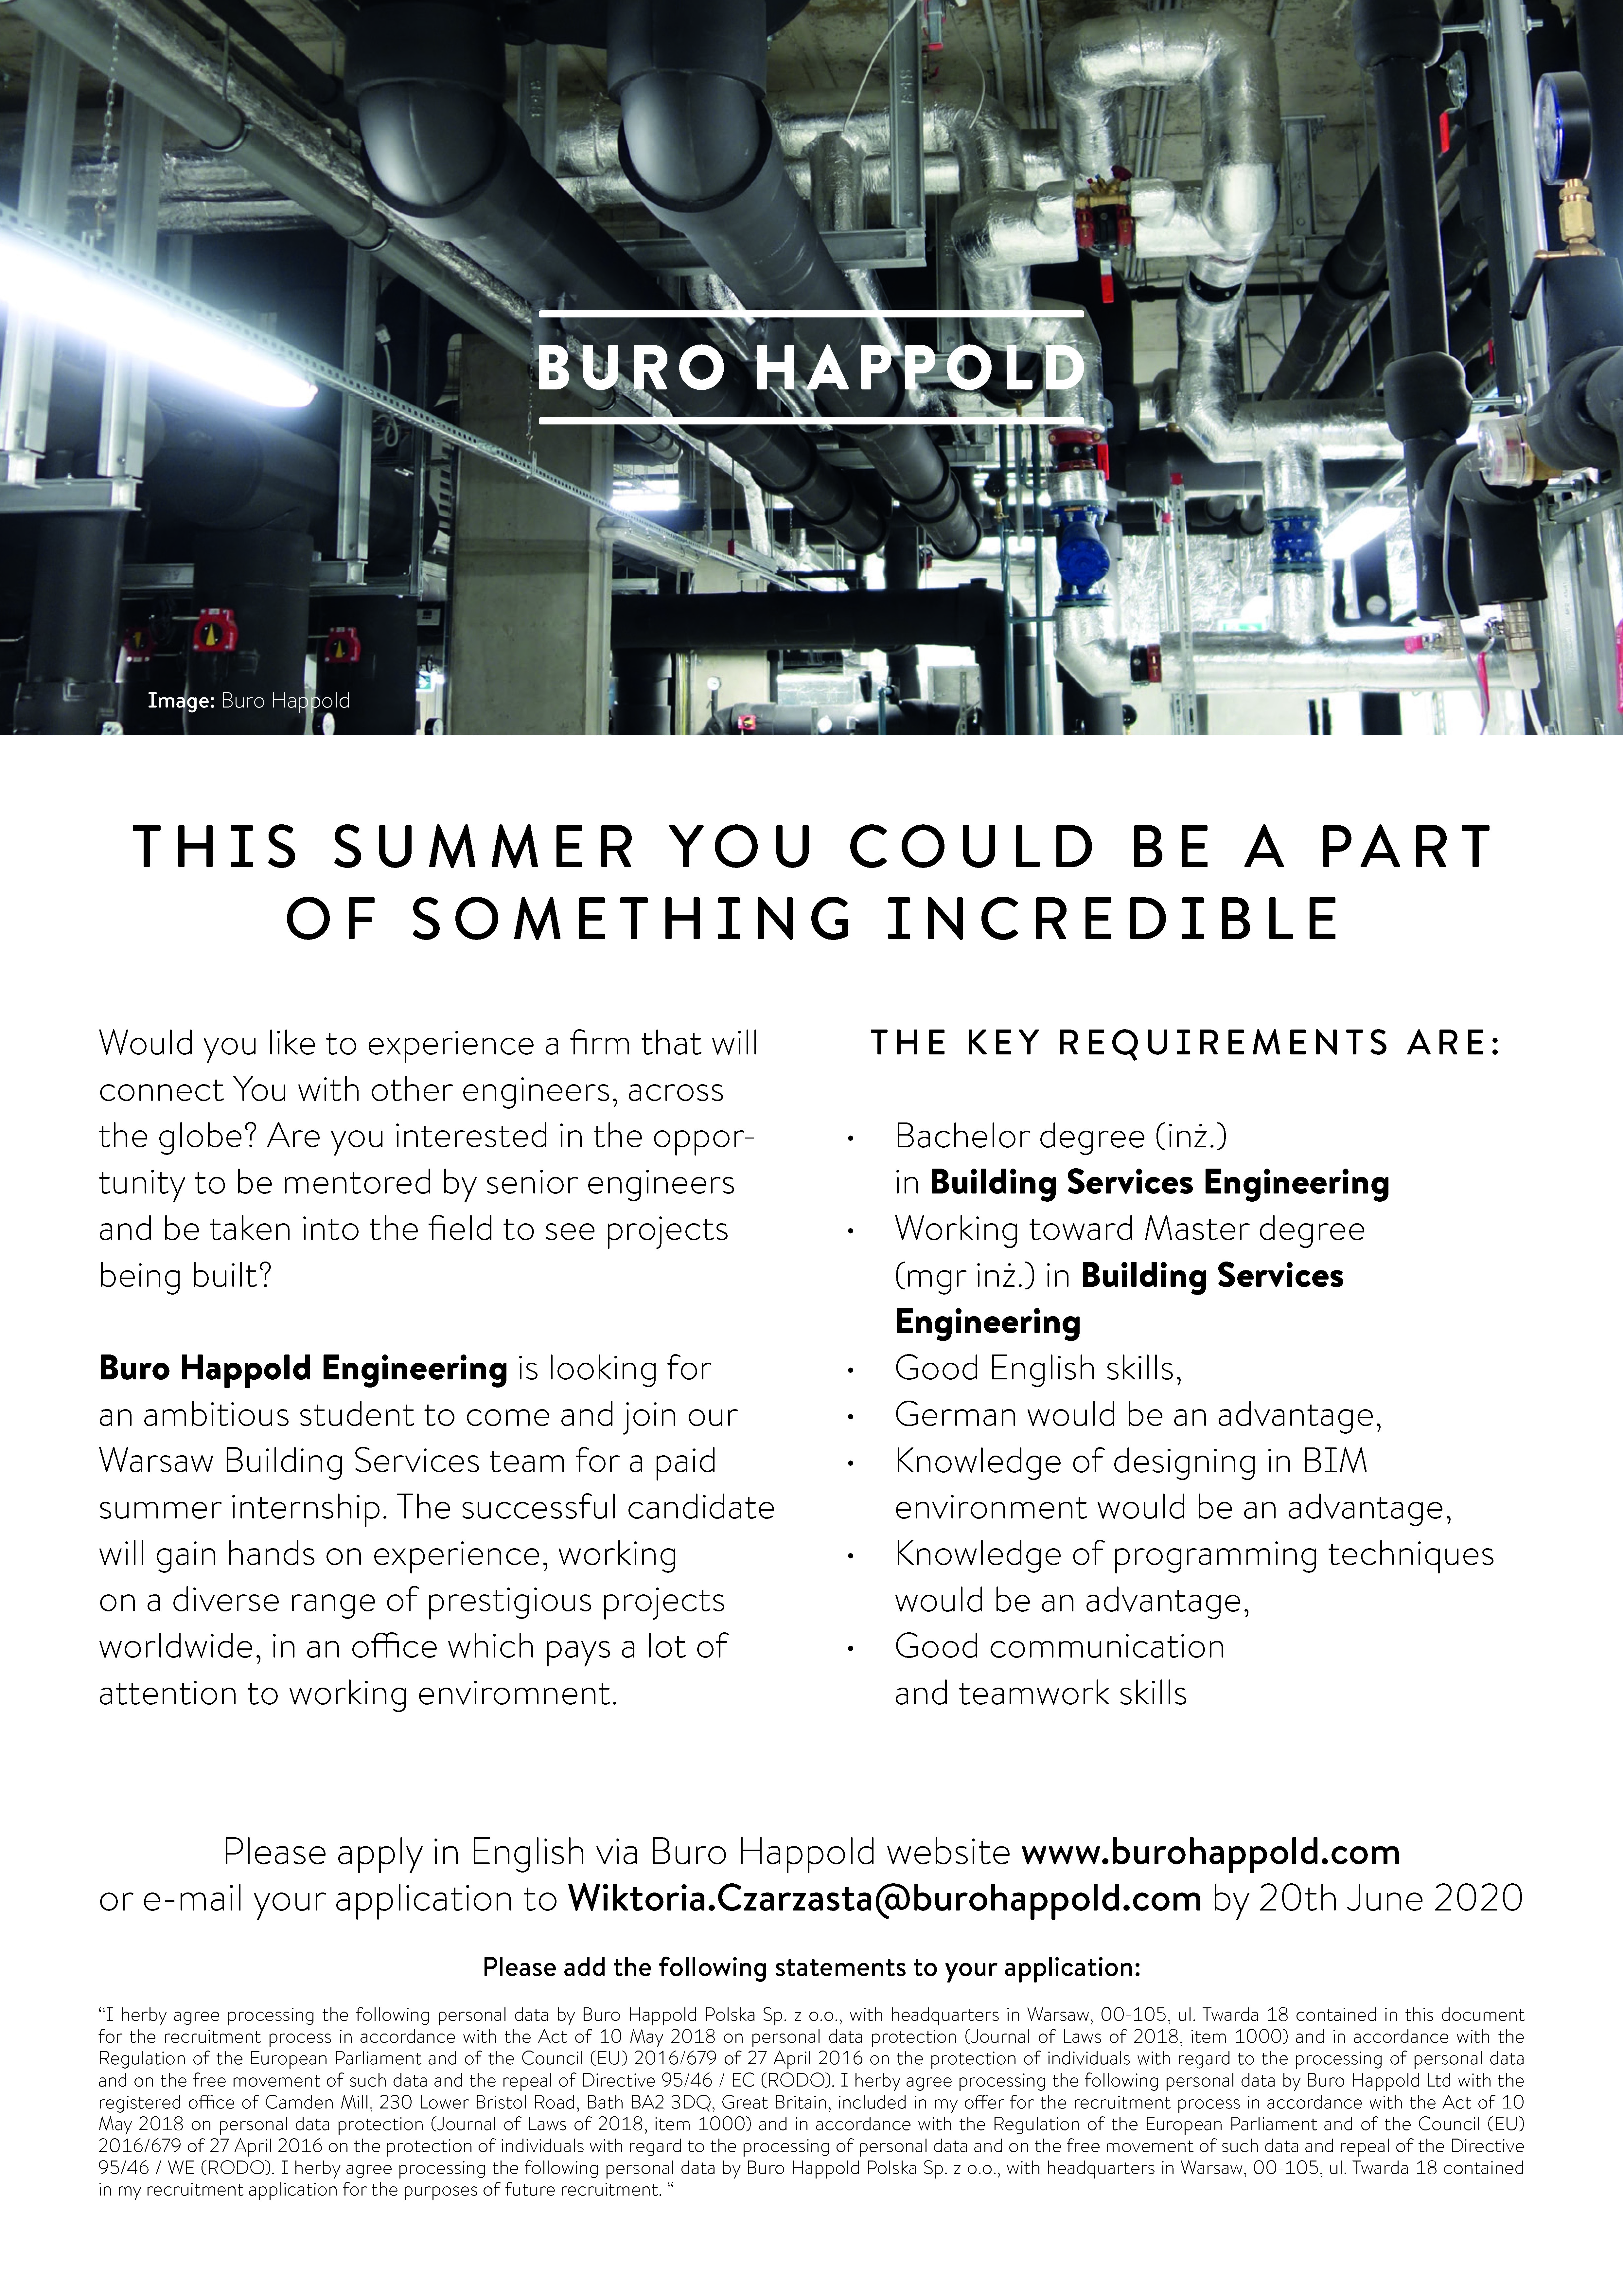 Letnie praktyki w Buro Happold